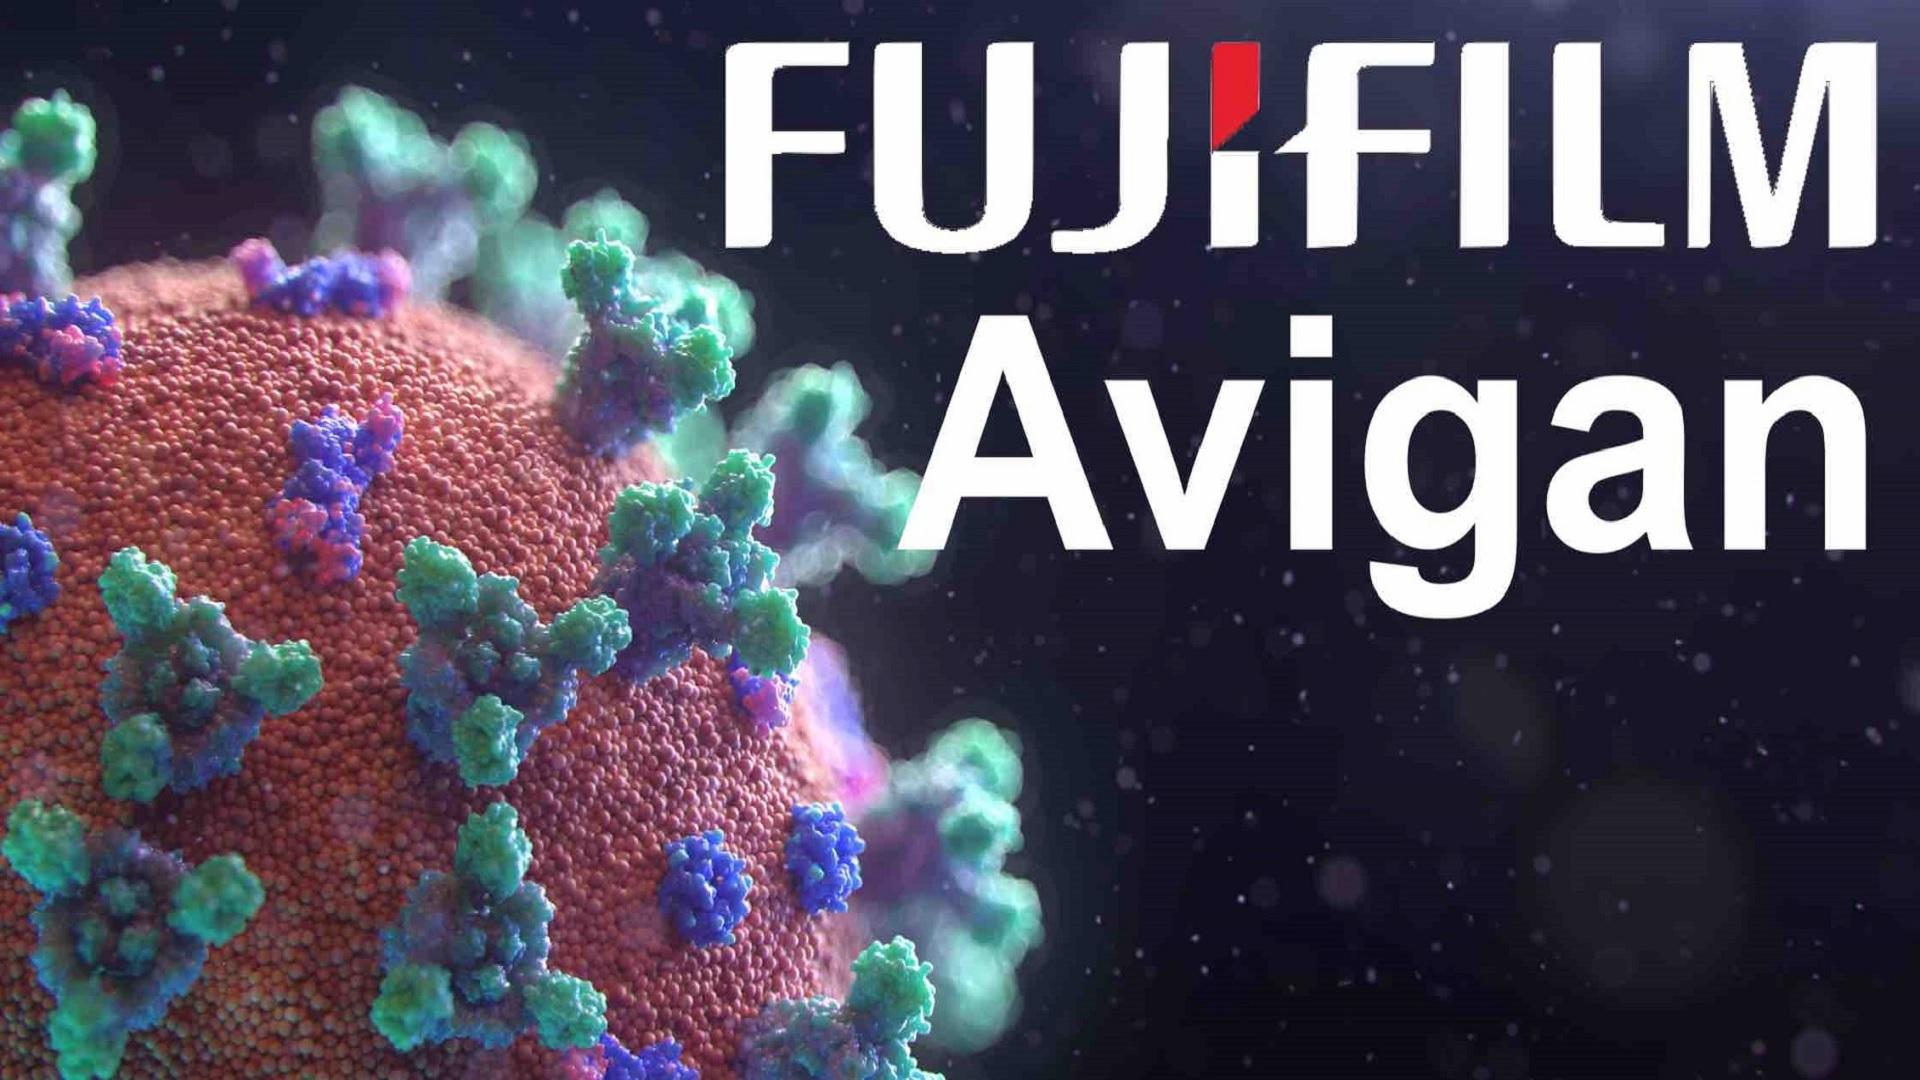 Fujifilm κορωνοϊός θεραπεία: Το αντιγριπικό φάρμακο Avigan βελτιώνει το χρόνο ανάρρωσης